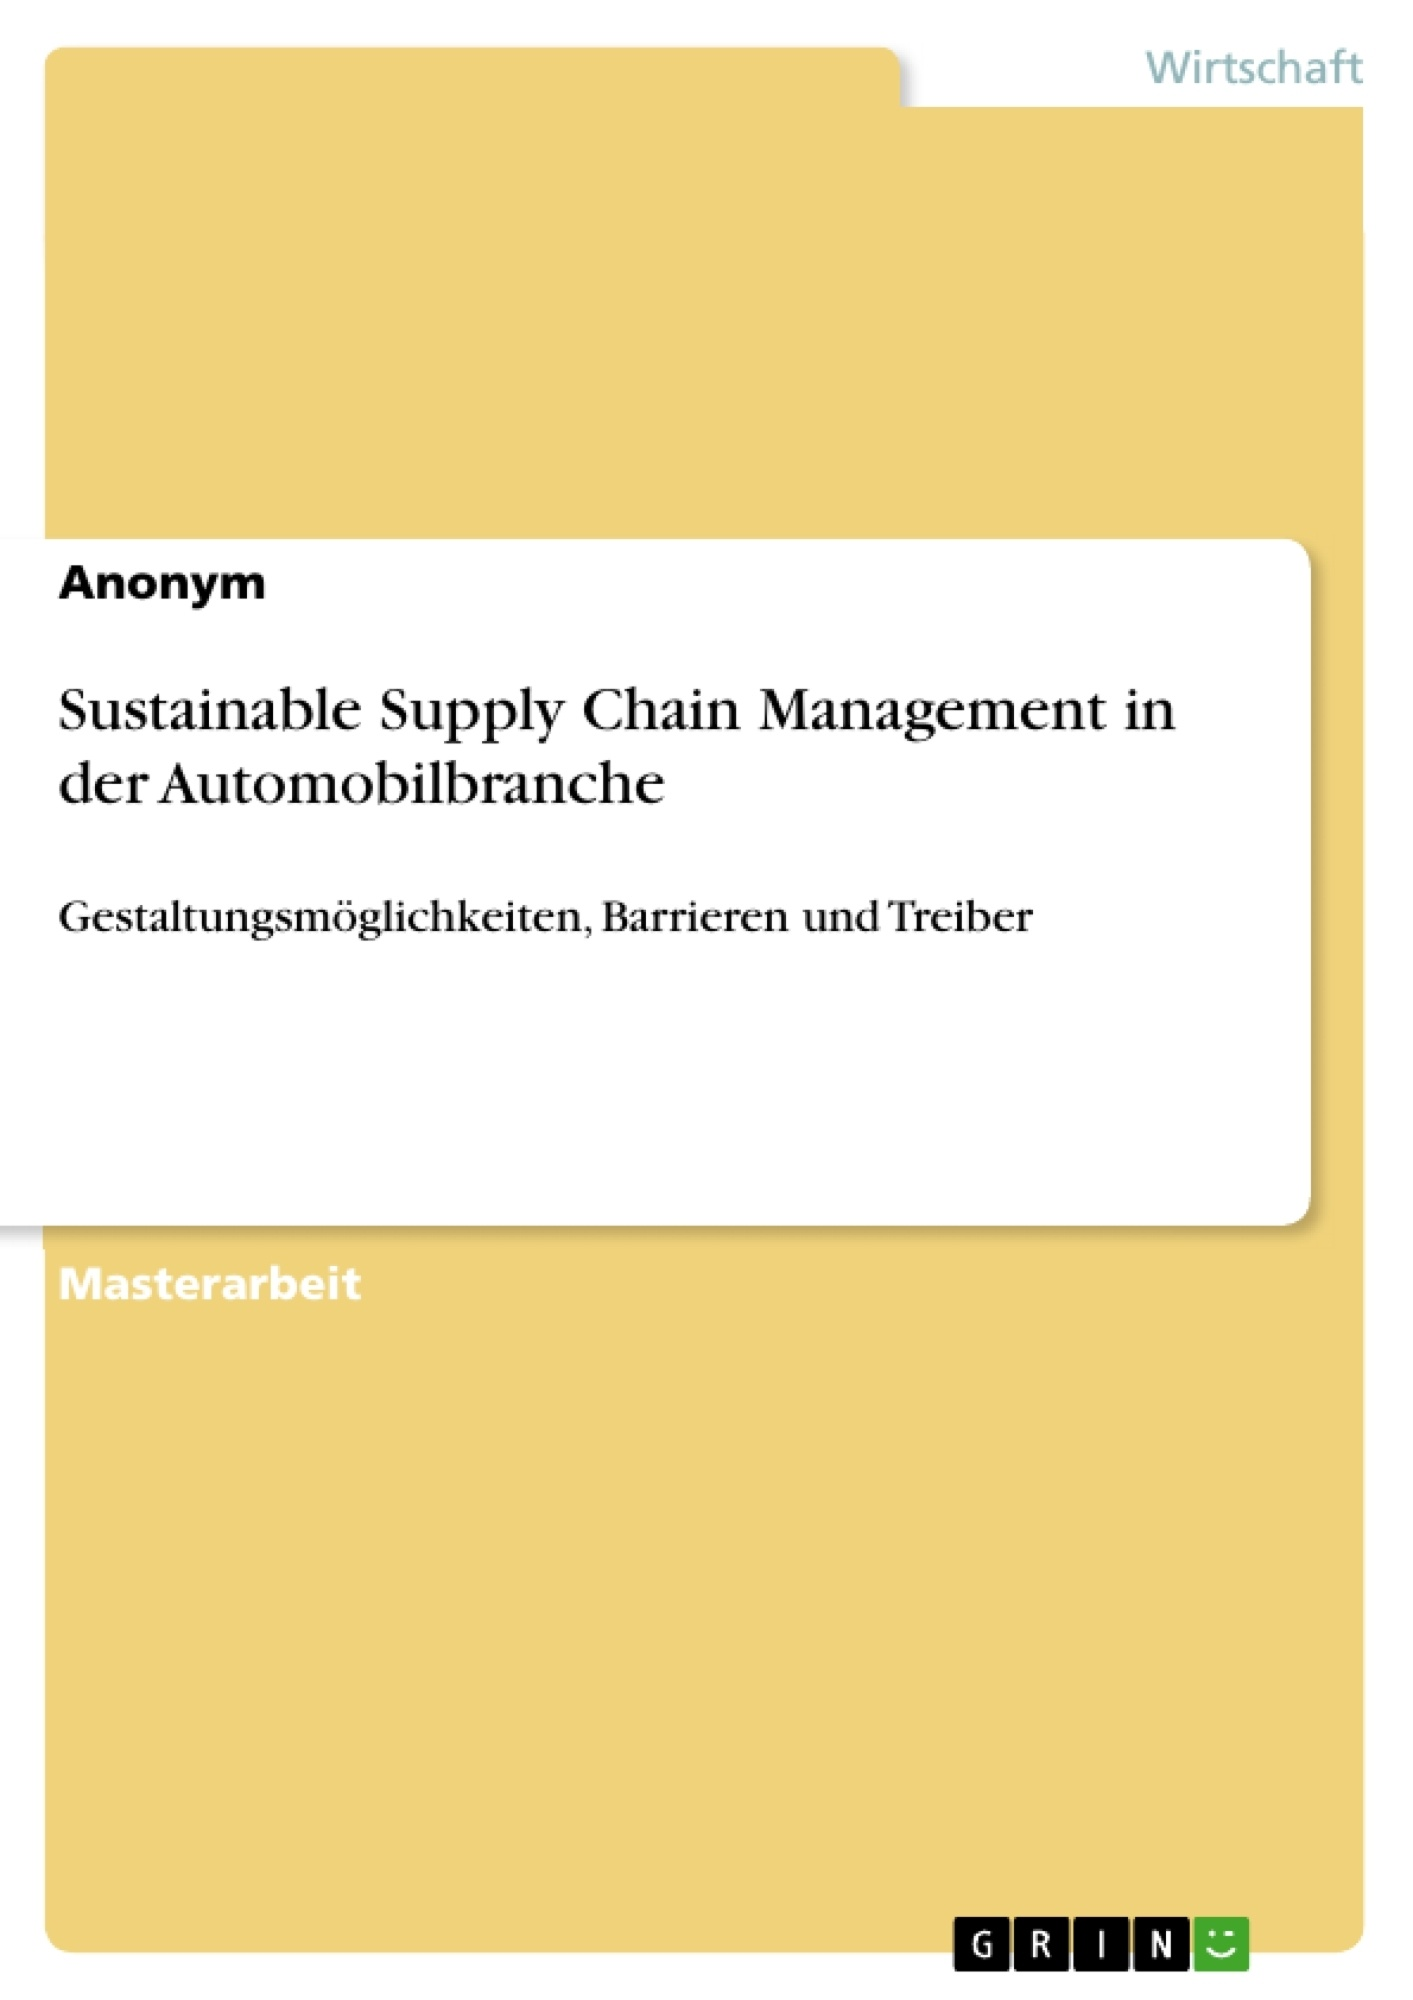 Titel: Sustainable Supply Chain Management in der Automobilbranche